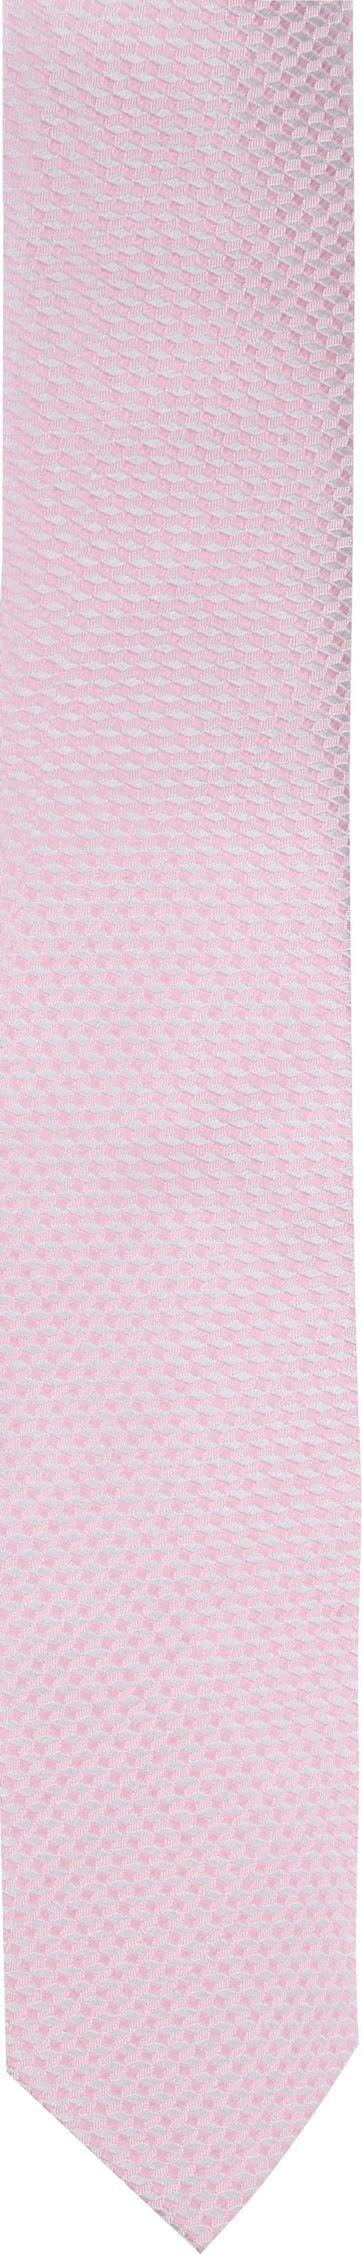 Suitable Tie Light Pink F01-35